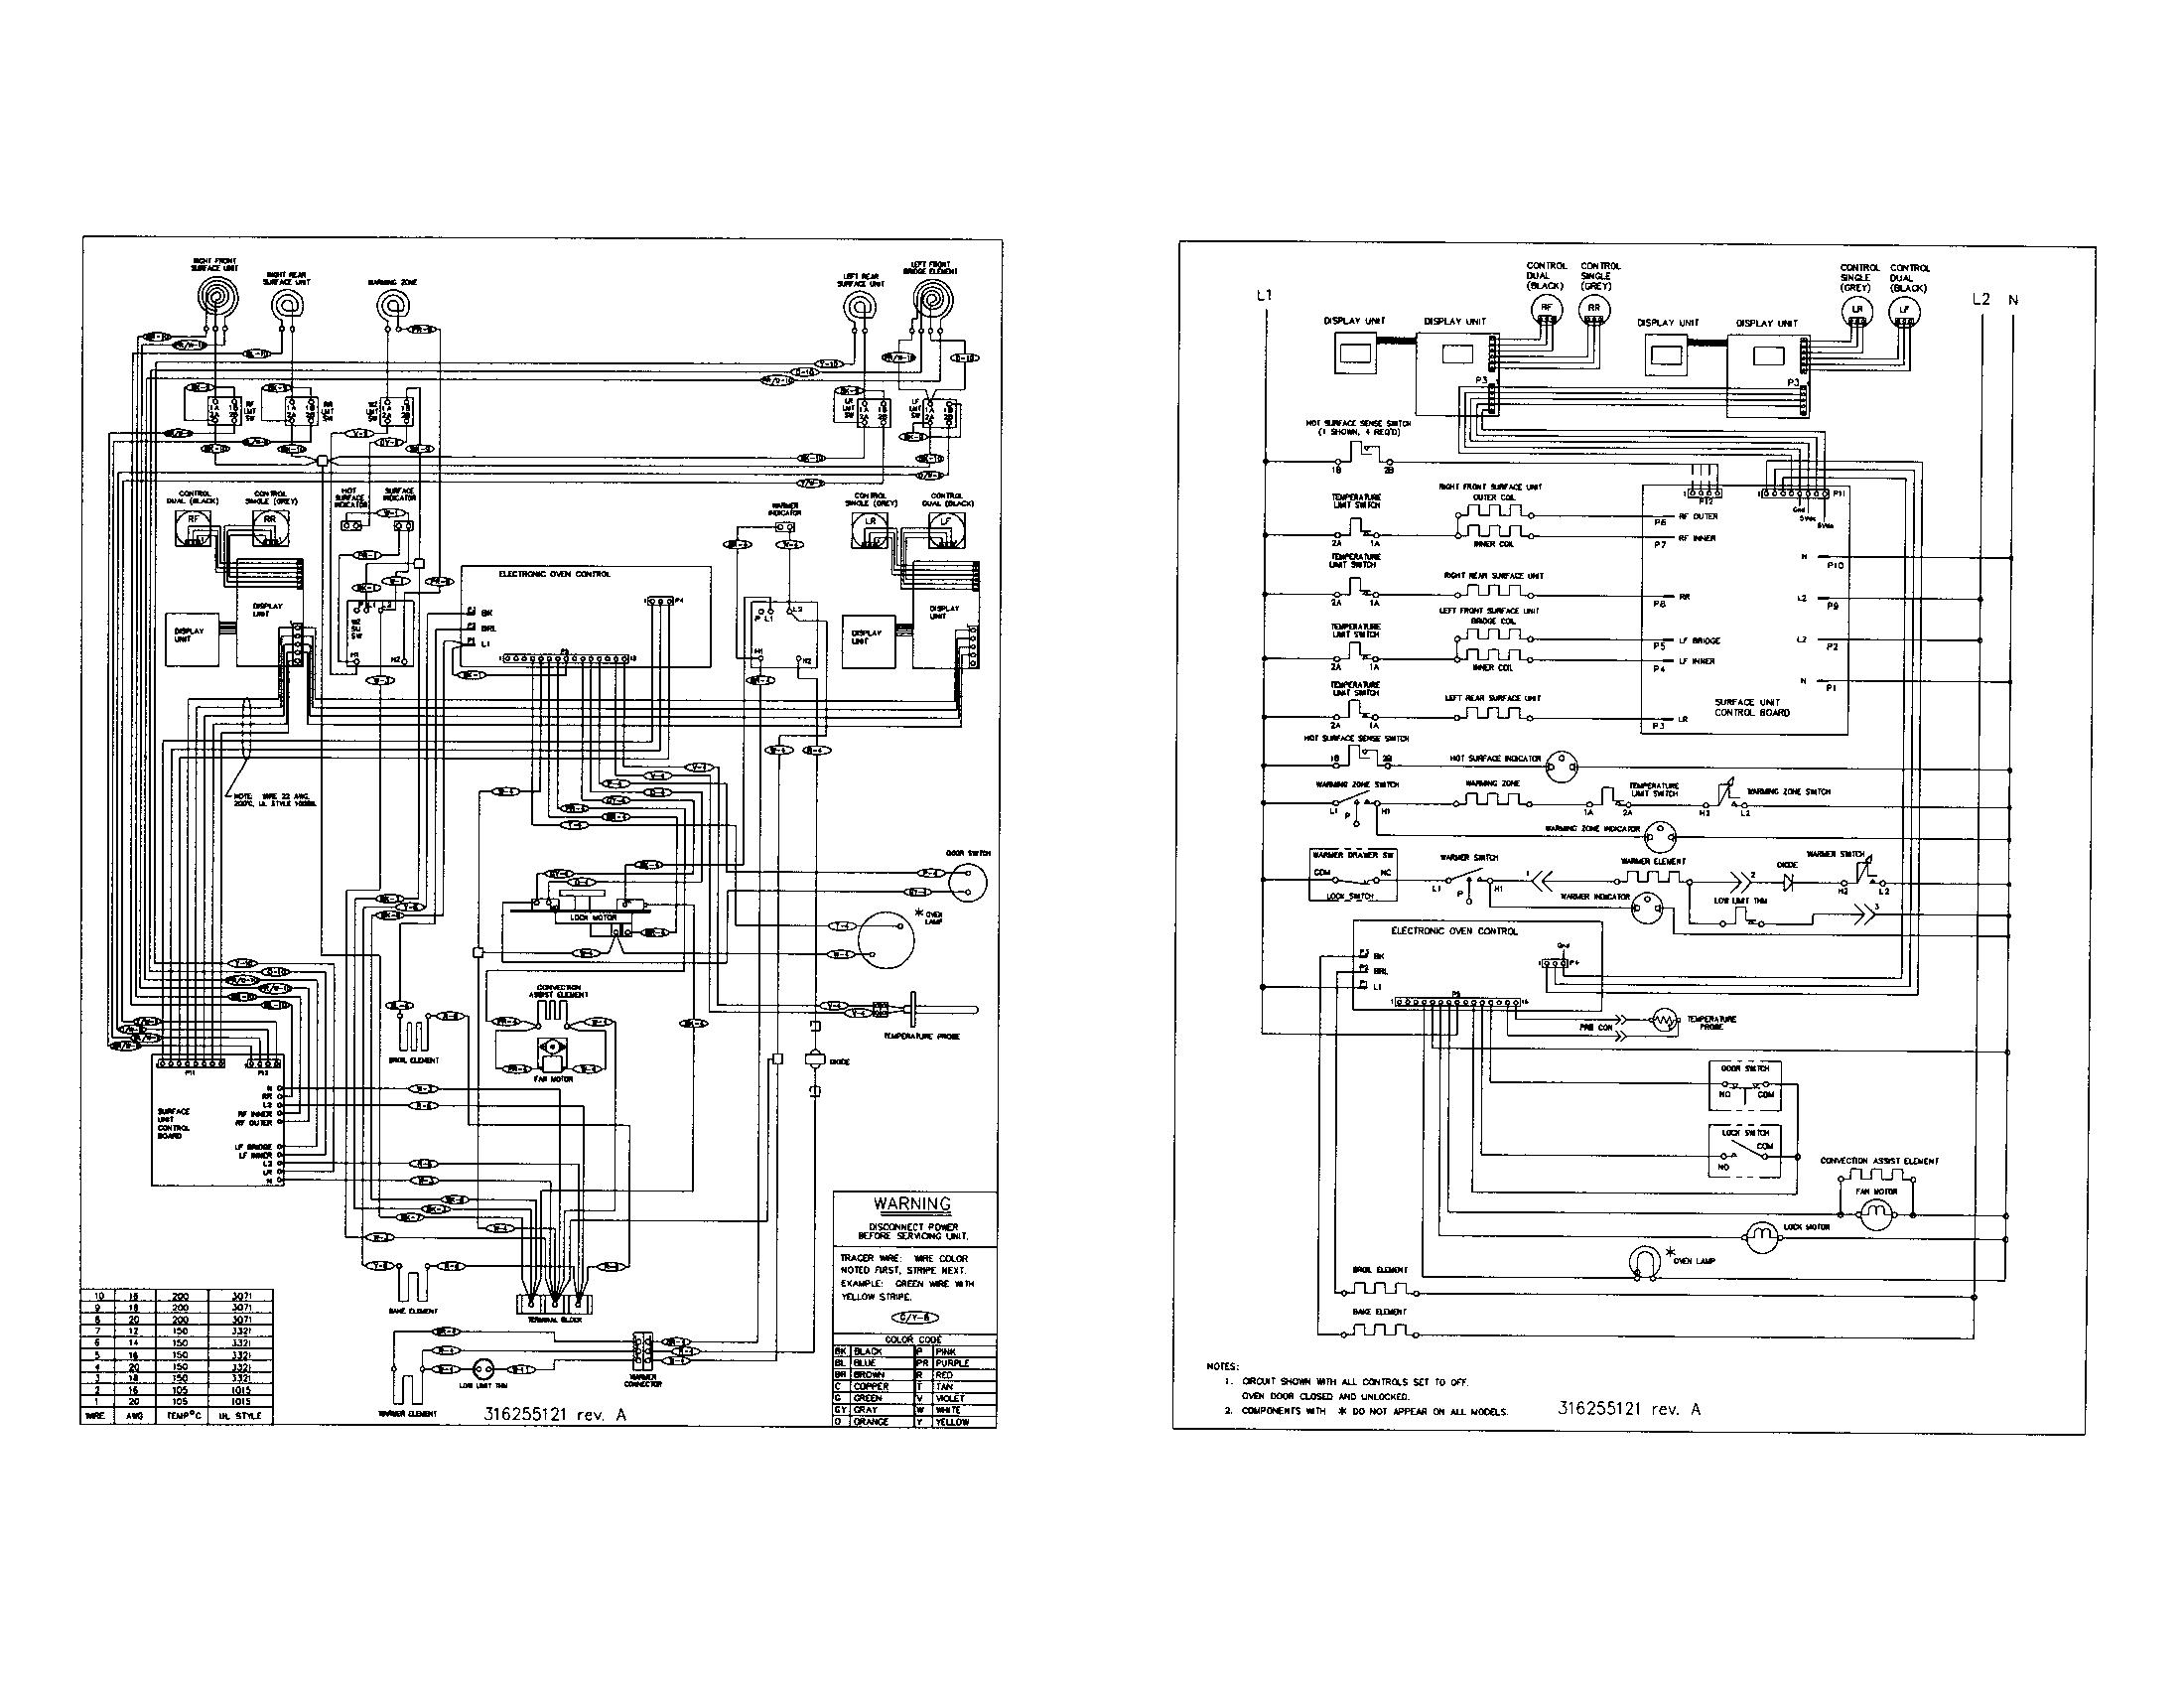 XZ_1660] Maker Wiring Diagram On Wiring Diagram Ge Dryer Parts Refrigerator Schematic  Wiring | Ge Oven Wiring Diagram Jsp28gop3bg |  | Terst Rous Tool Mohammedshrine Librar Wiring 101